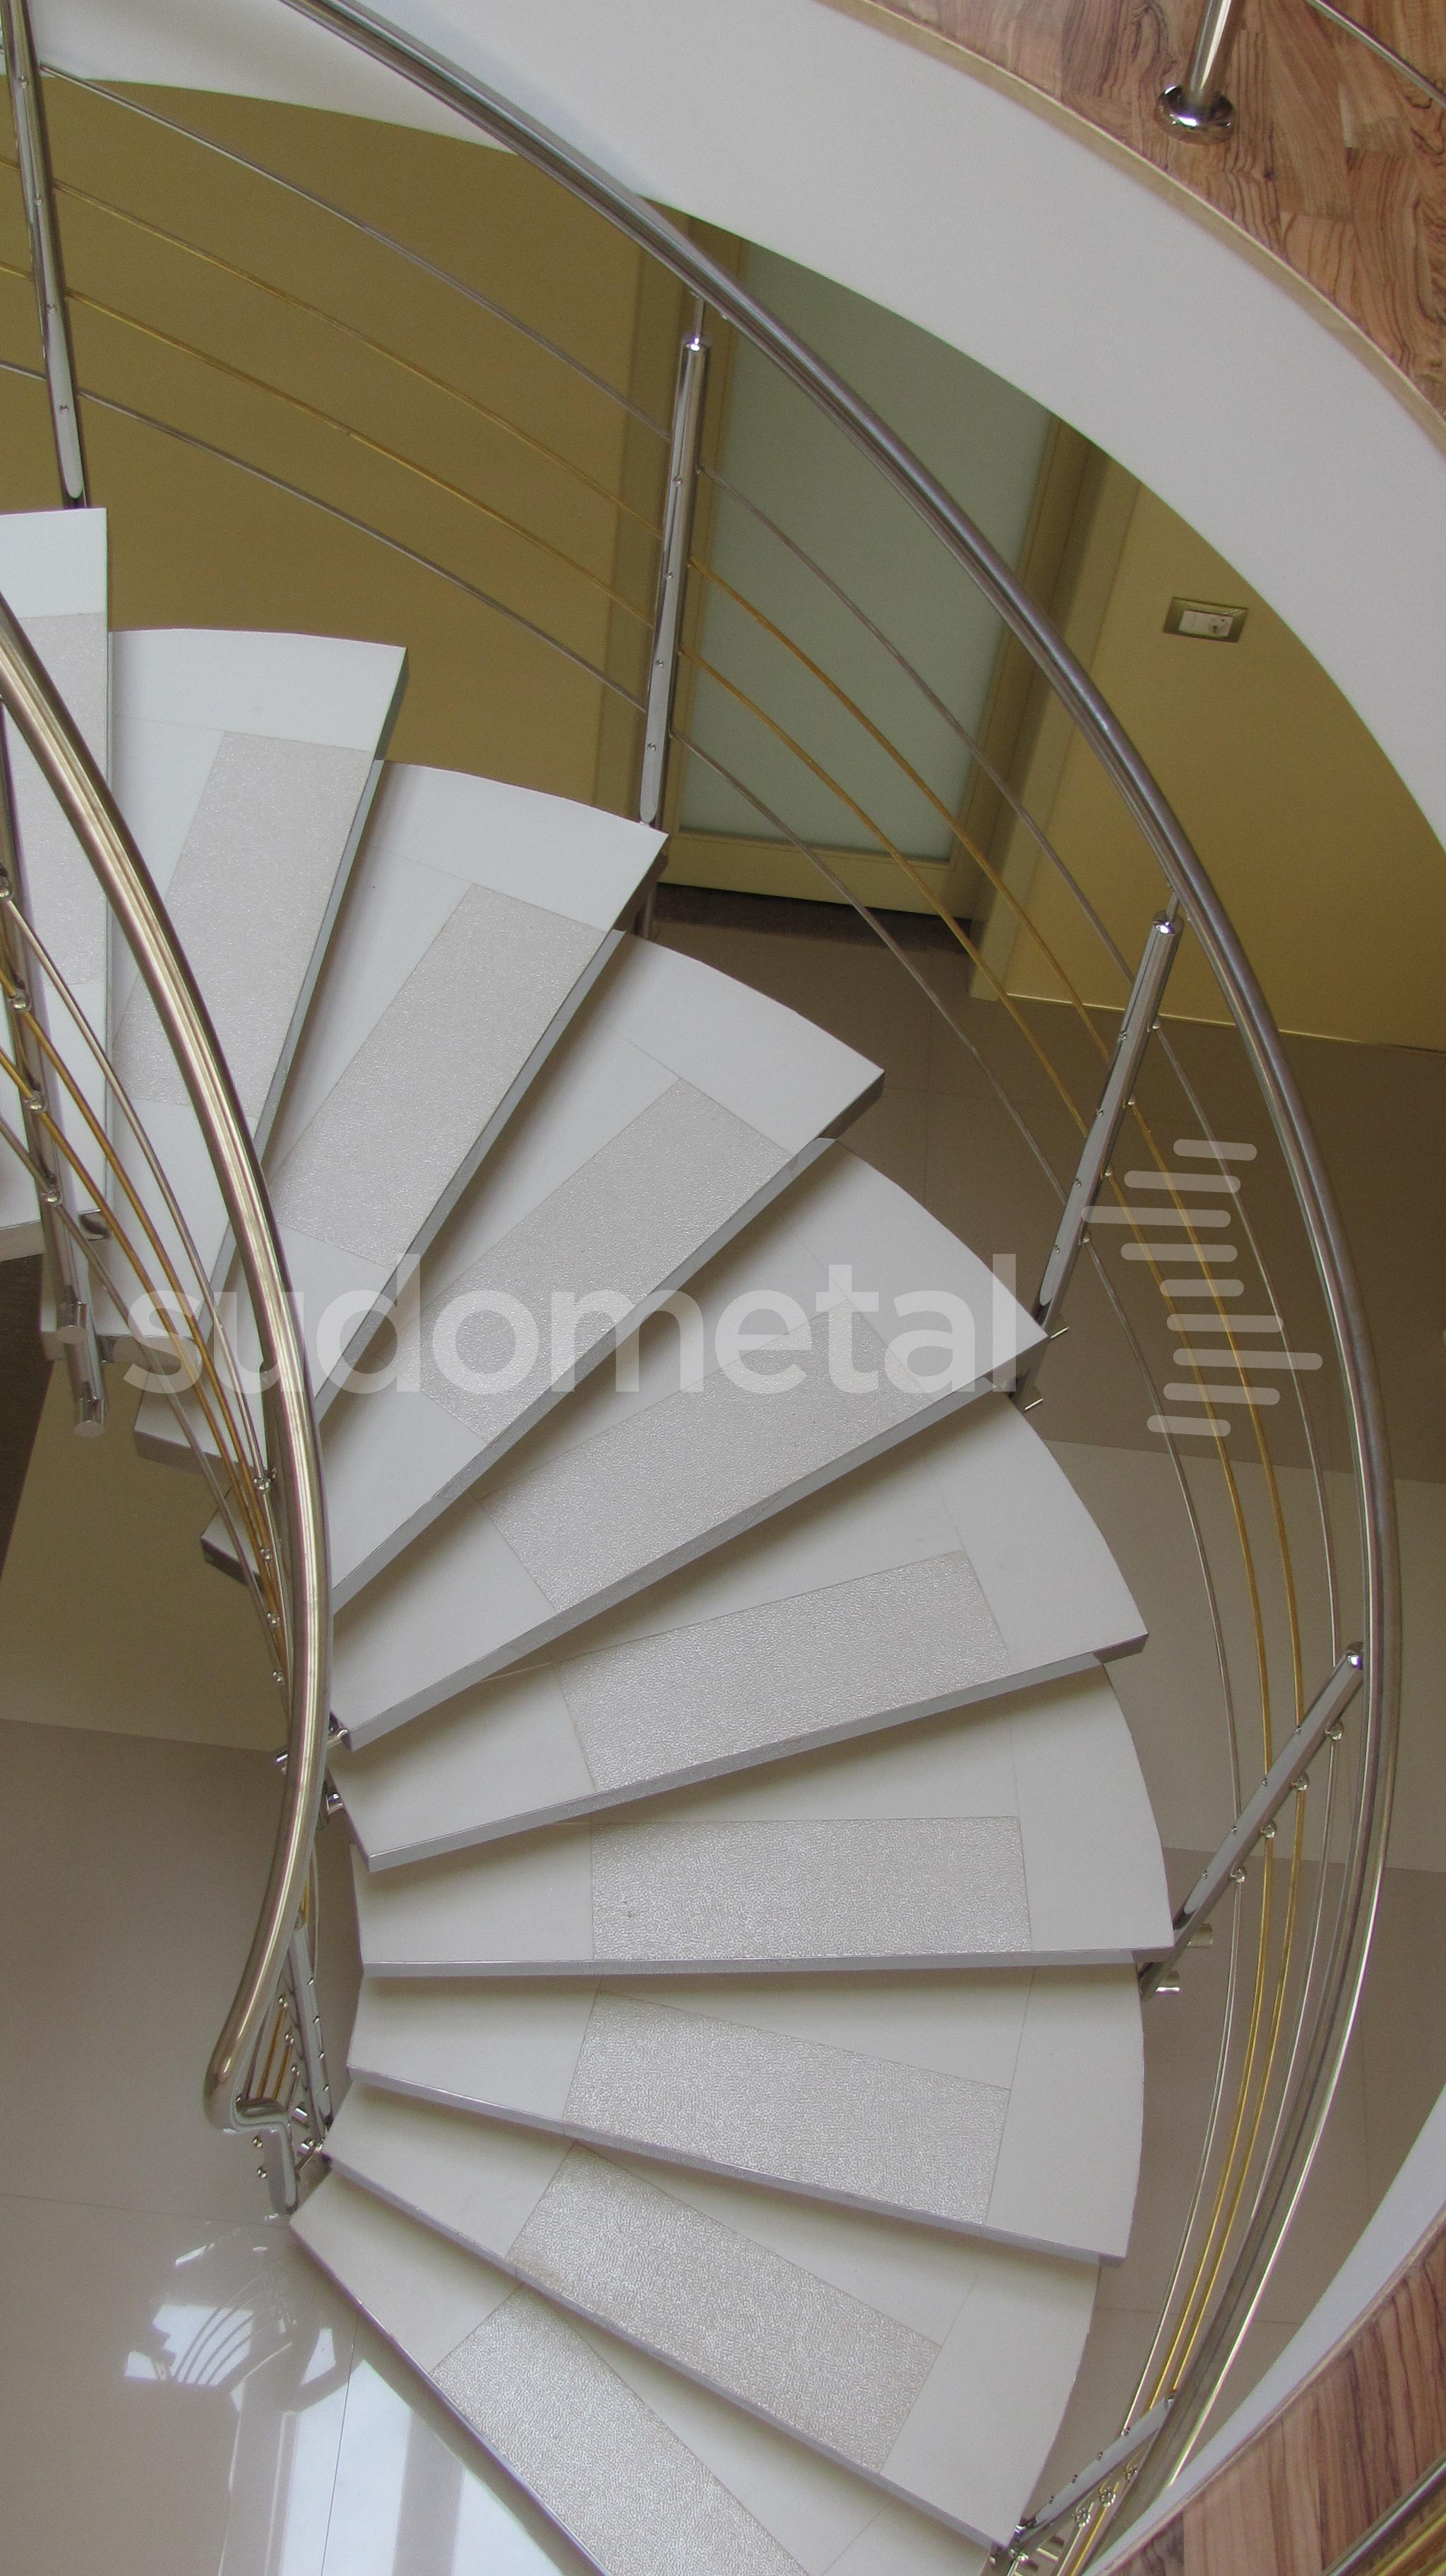 Scari cu vang central - Scara circulara casa particulara SUDOMETAL - Poza 2